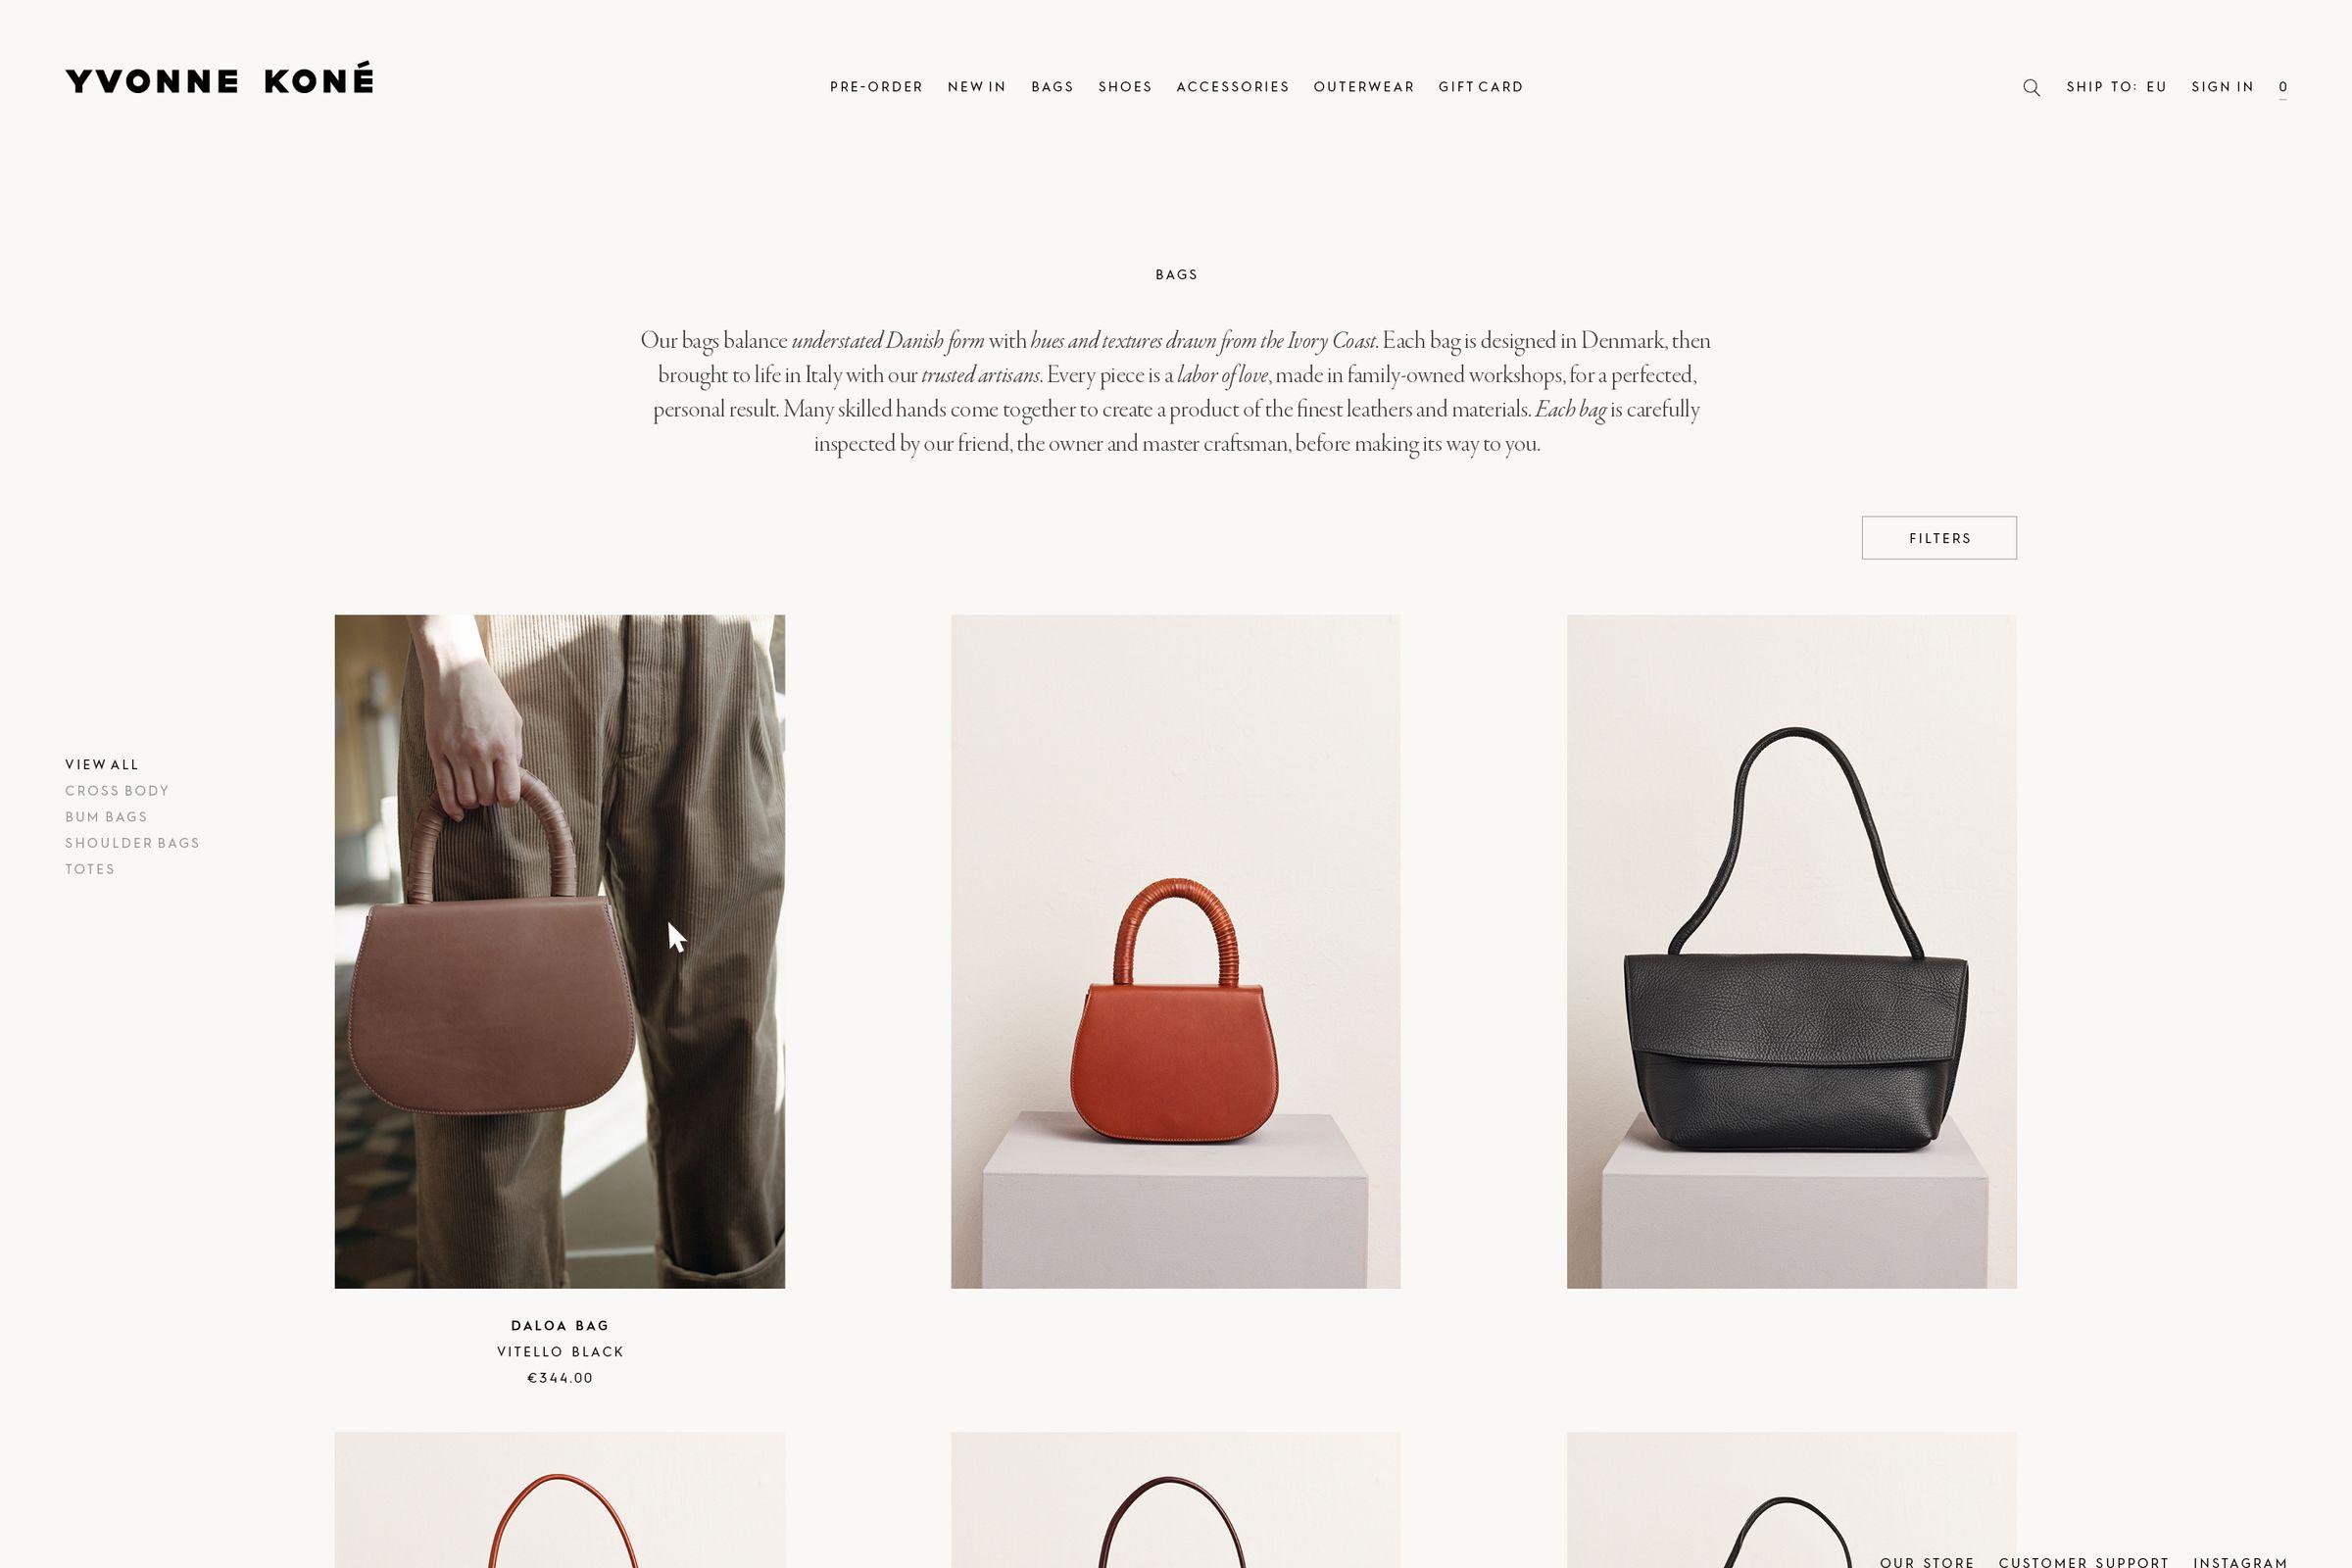 Yvonne Kone website design ecommerce bags